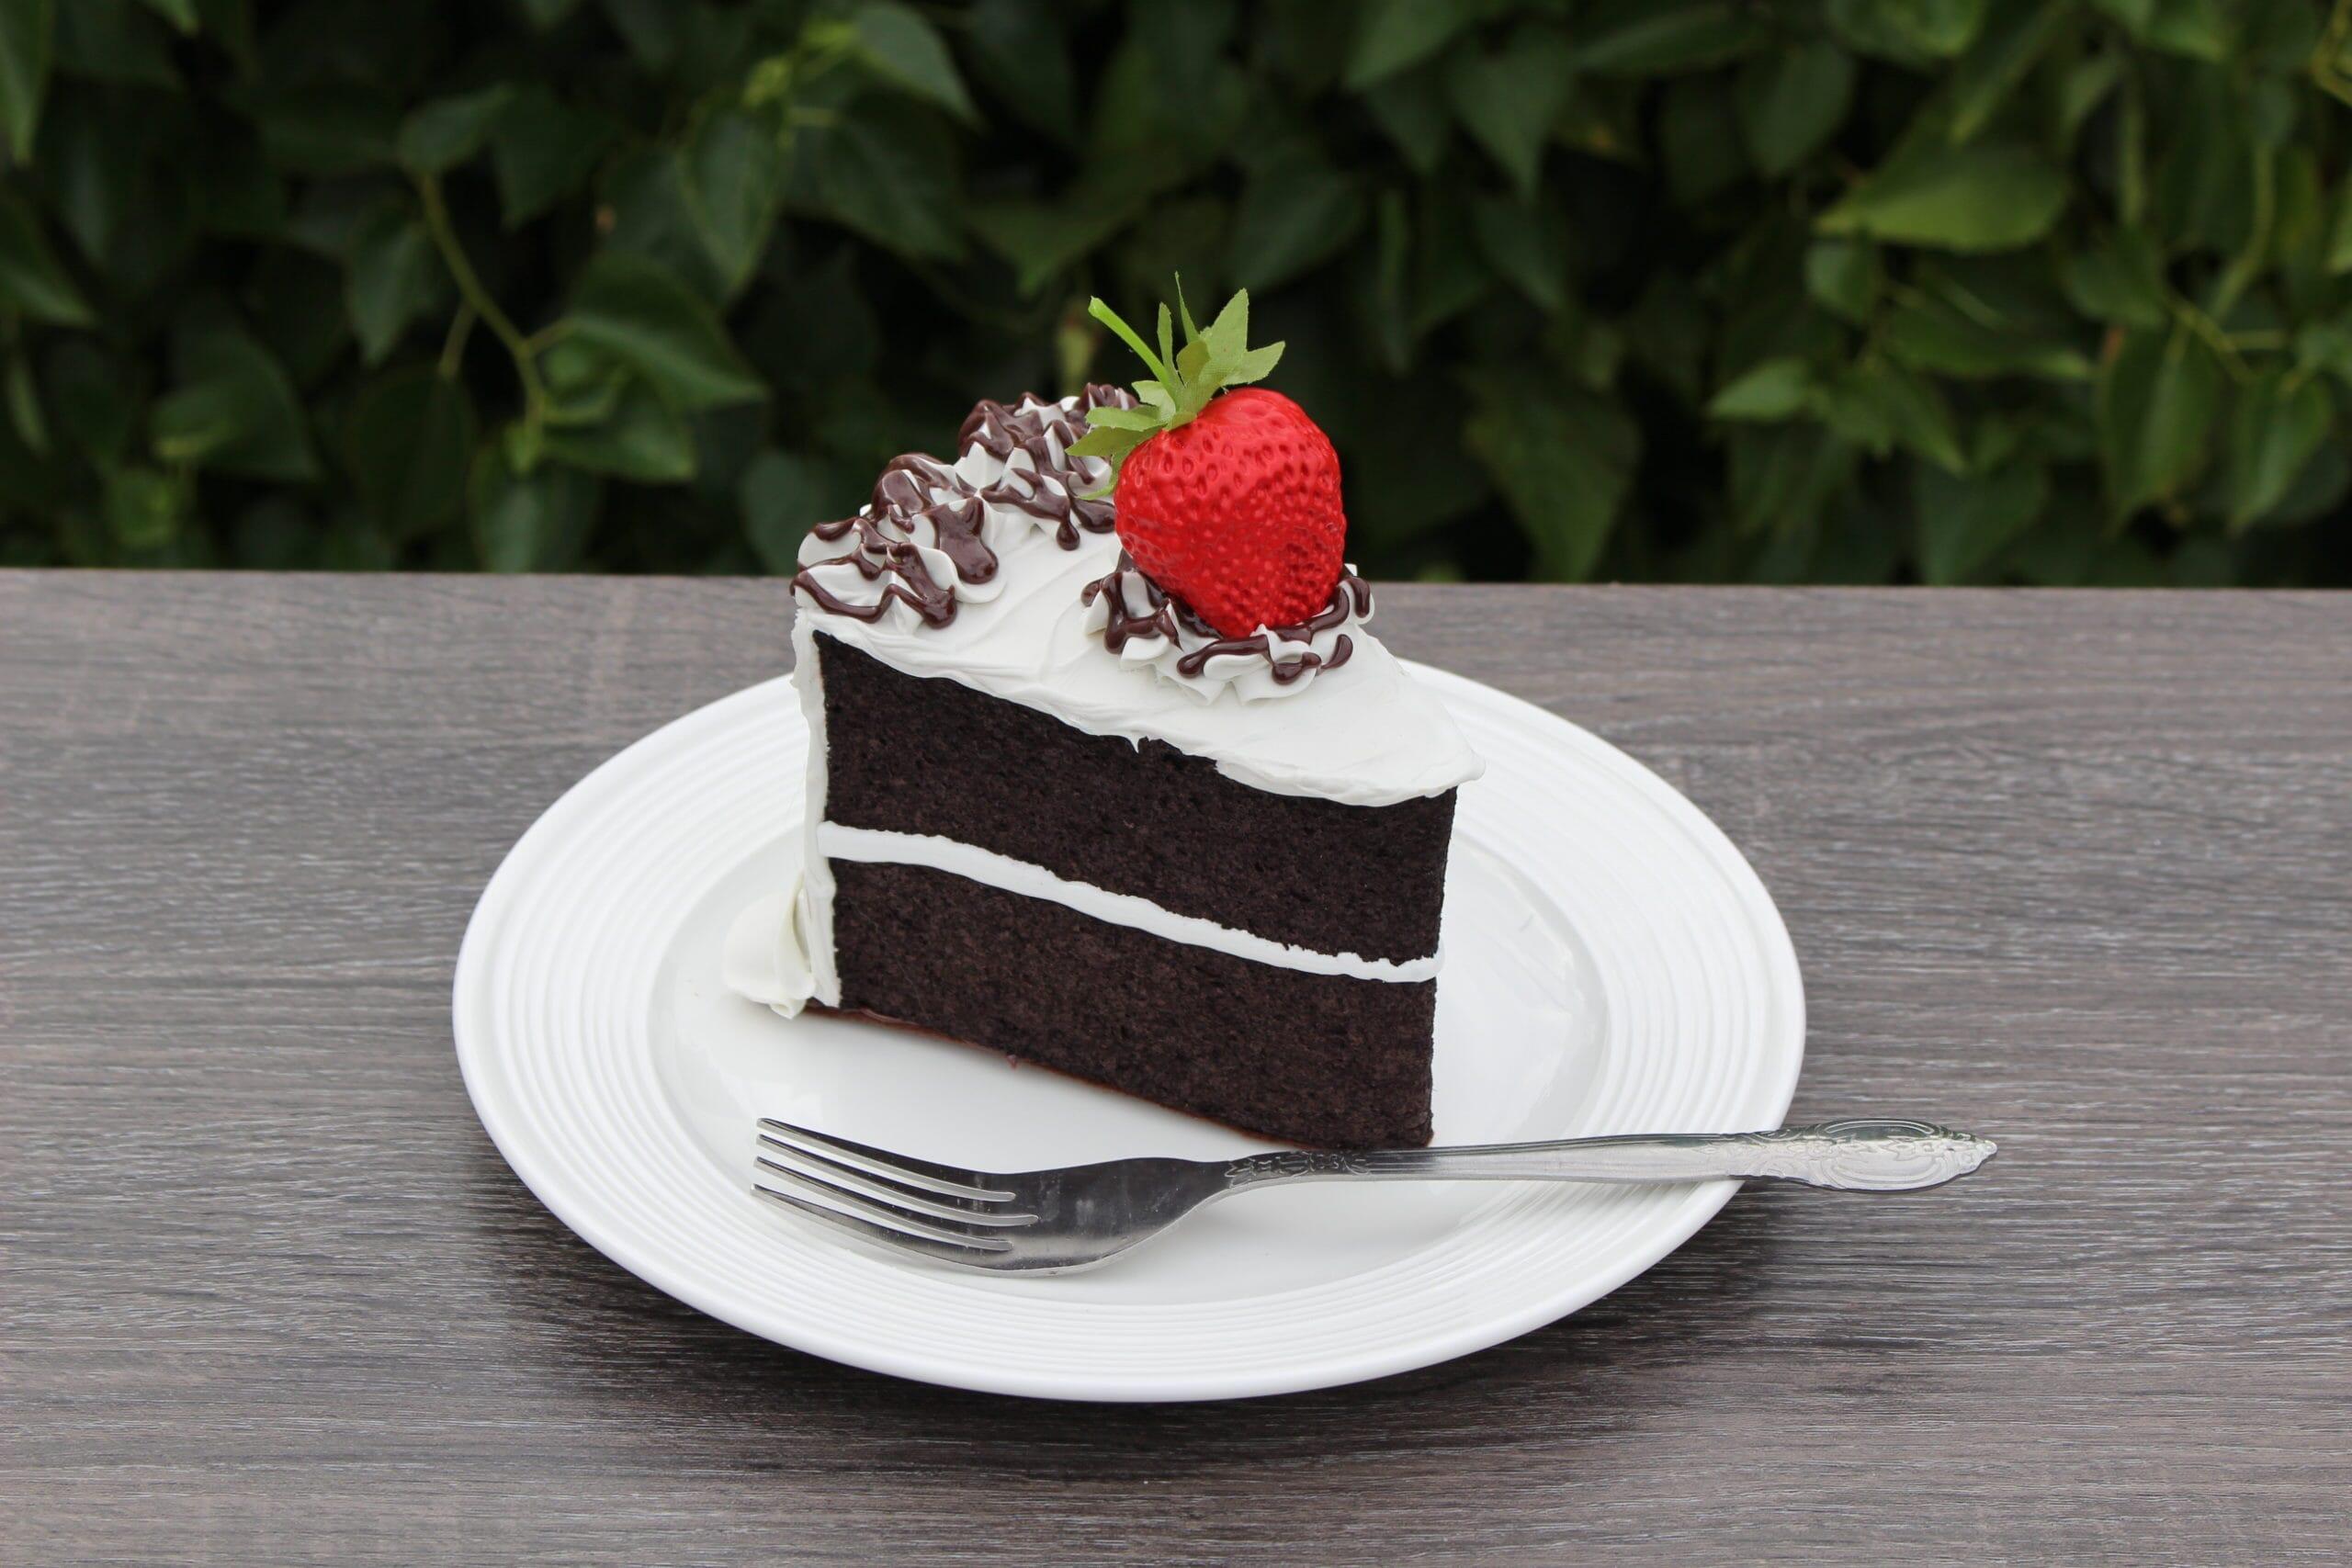 Fake Vanilla Frosted Slice of Chocolate Cake